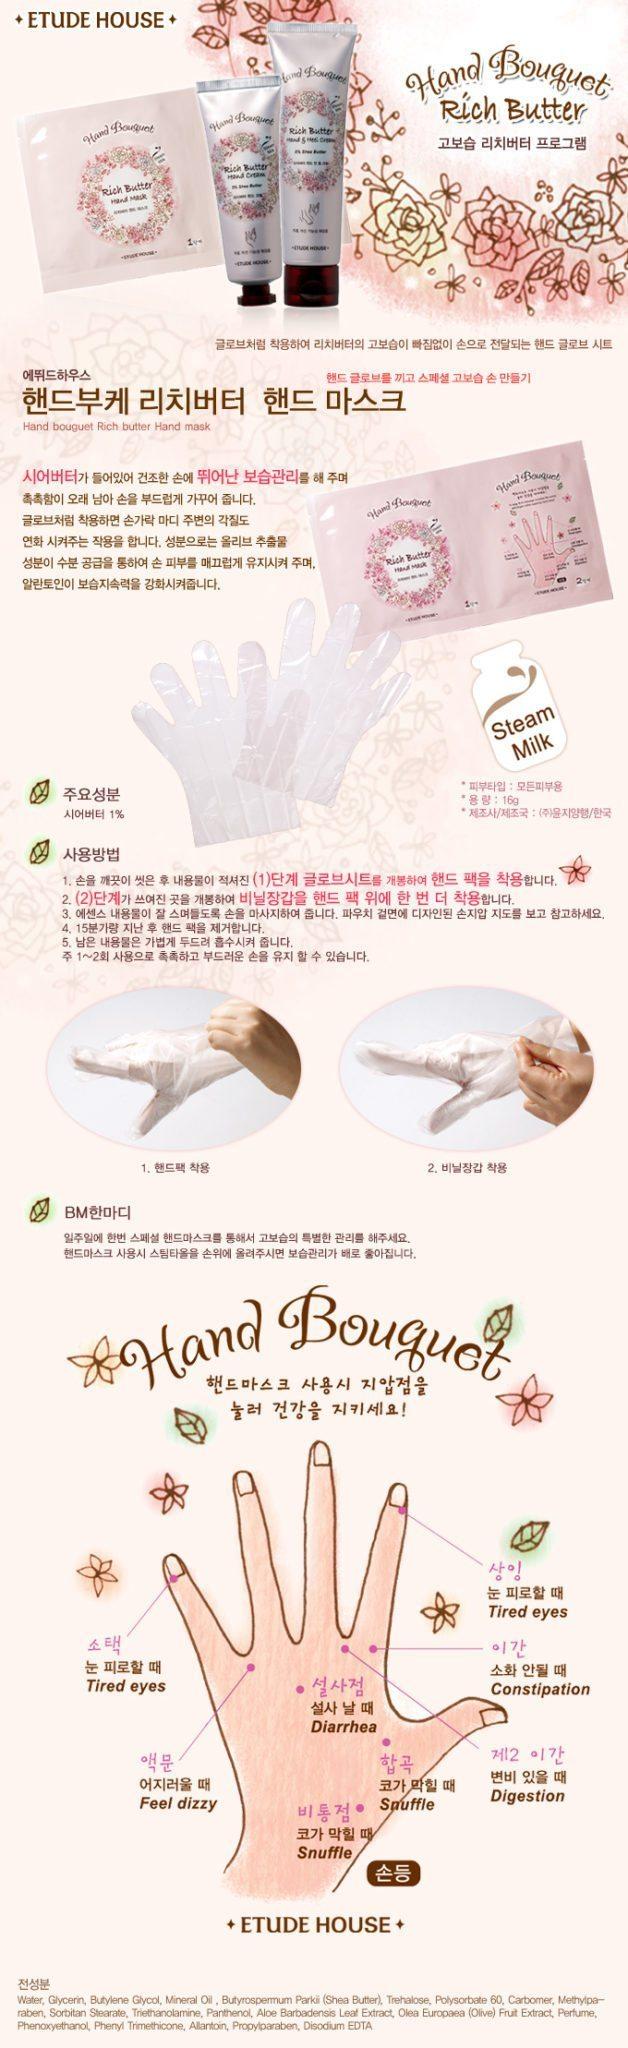 Etude House Hand Bouquet Rich Butter Hand Mask 16g malaysia1